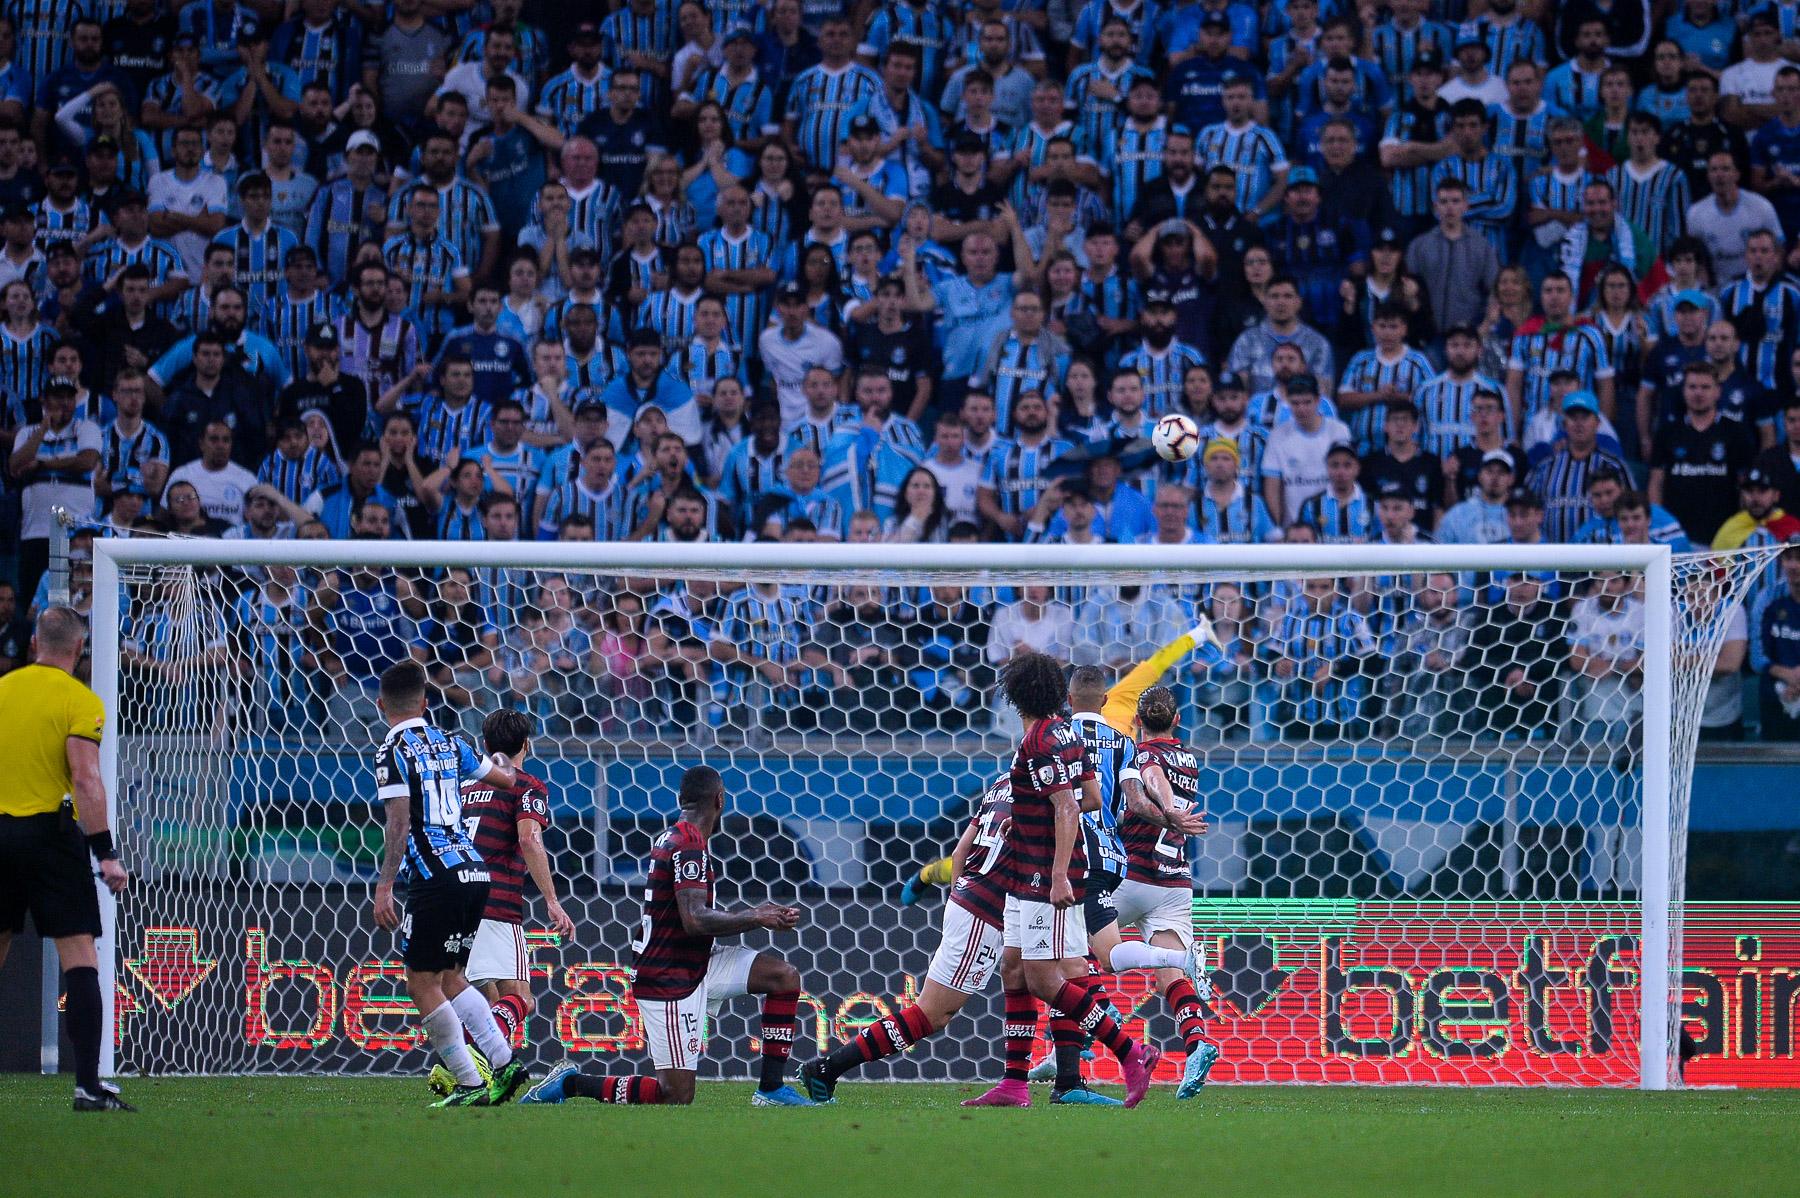 Gremio_X_Flamengo_dudabairros_Eleven_168